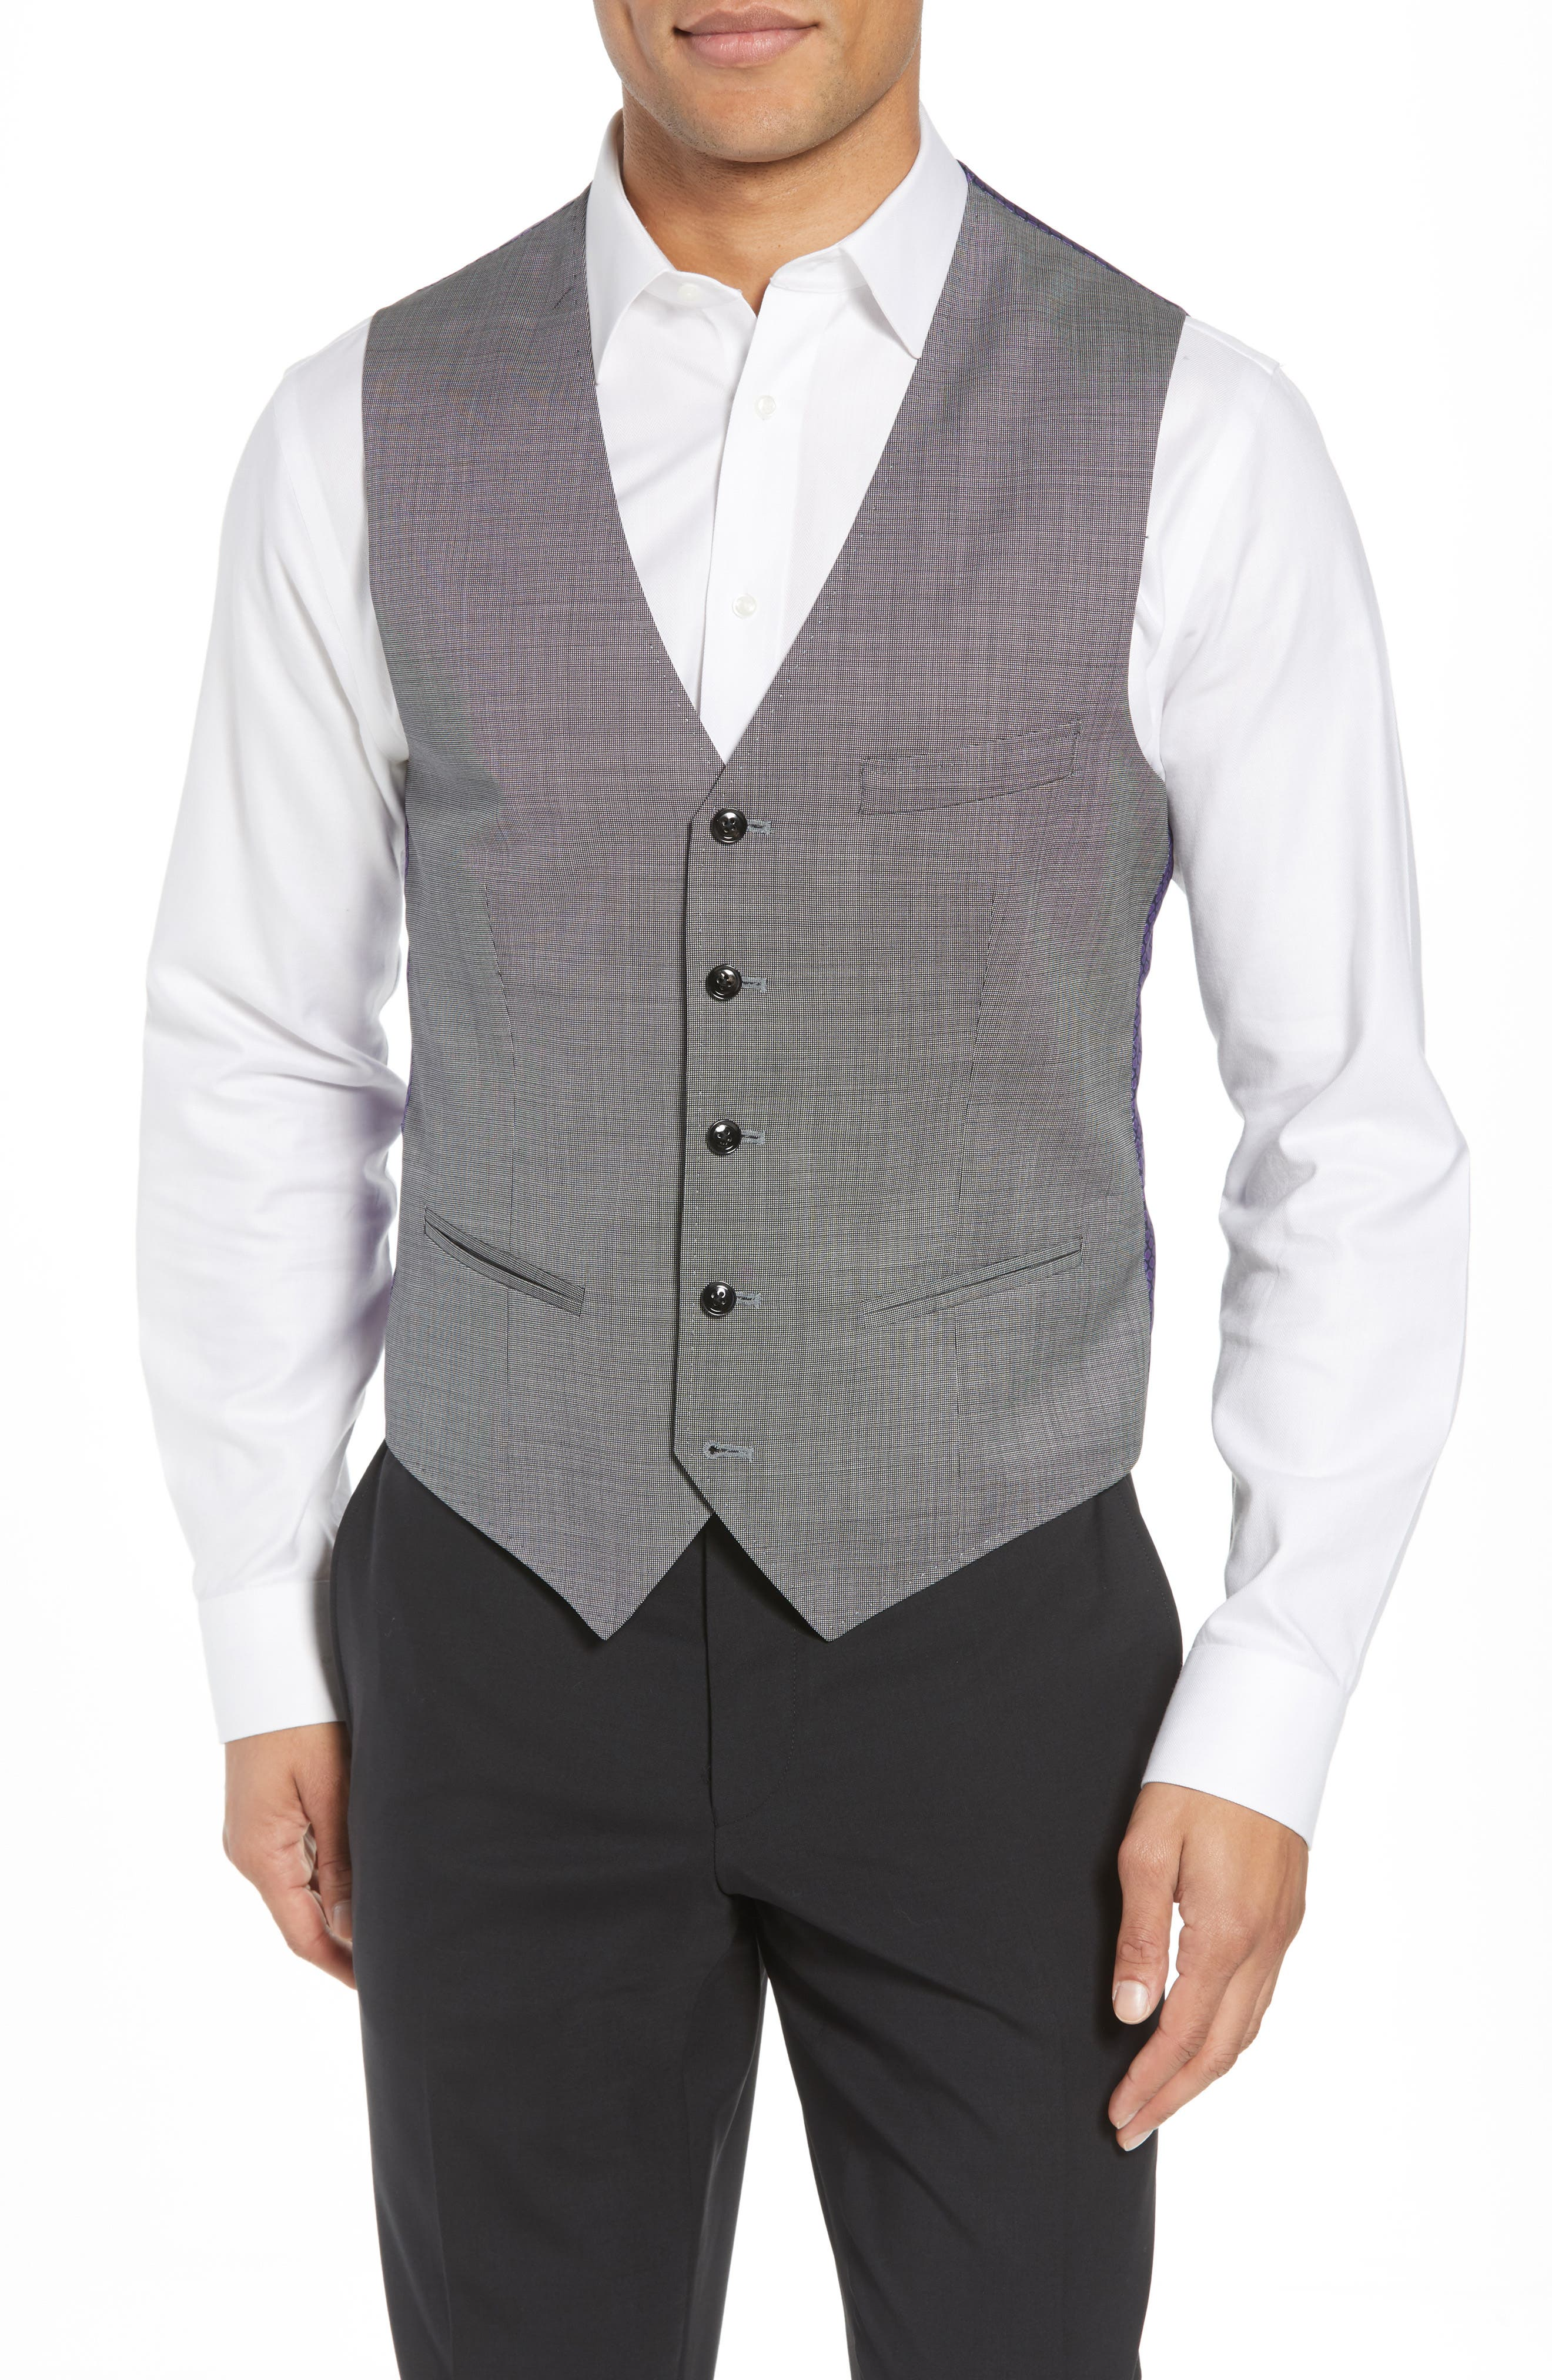 Troy Trim Fit Solid Wool Vest,                             Main thumbnail 1, color,                             LIGHT GREY